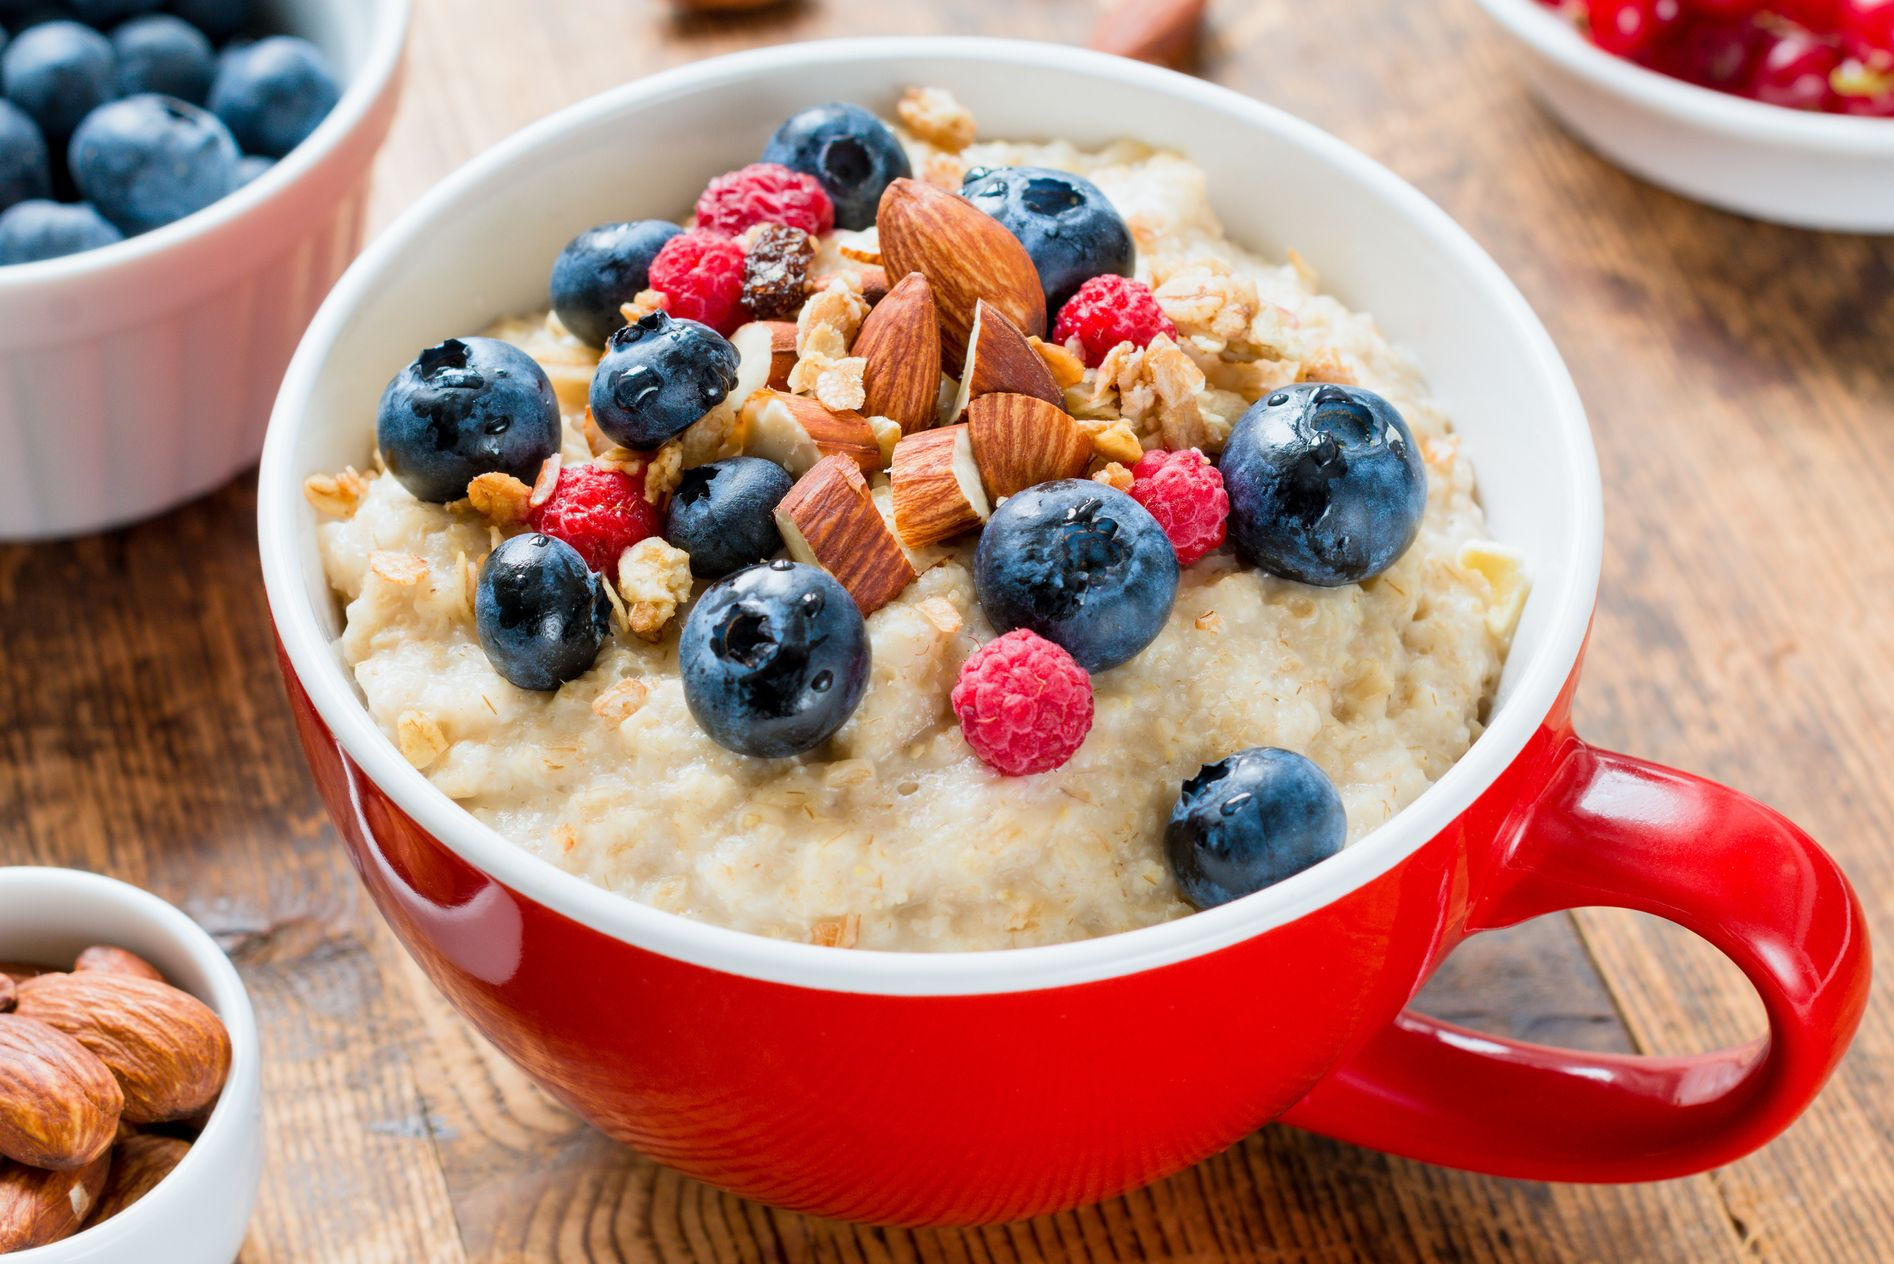 Oatmeal porridge with blueberries, raspberries and almonds